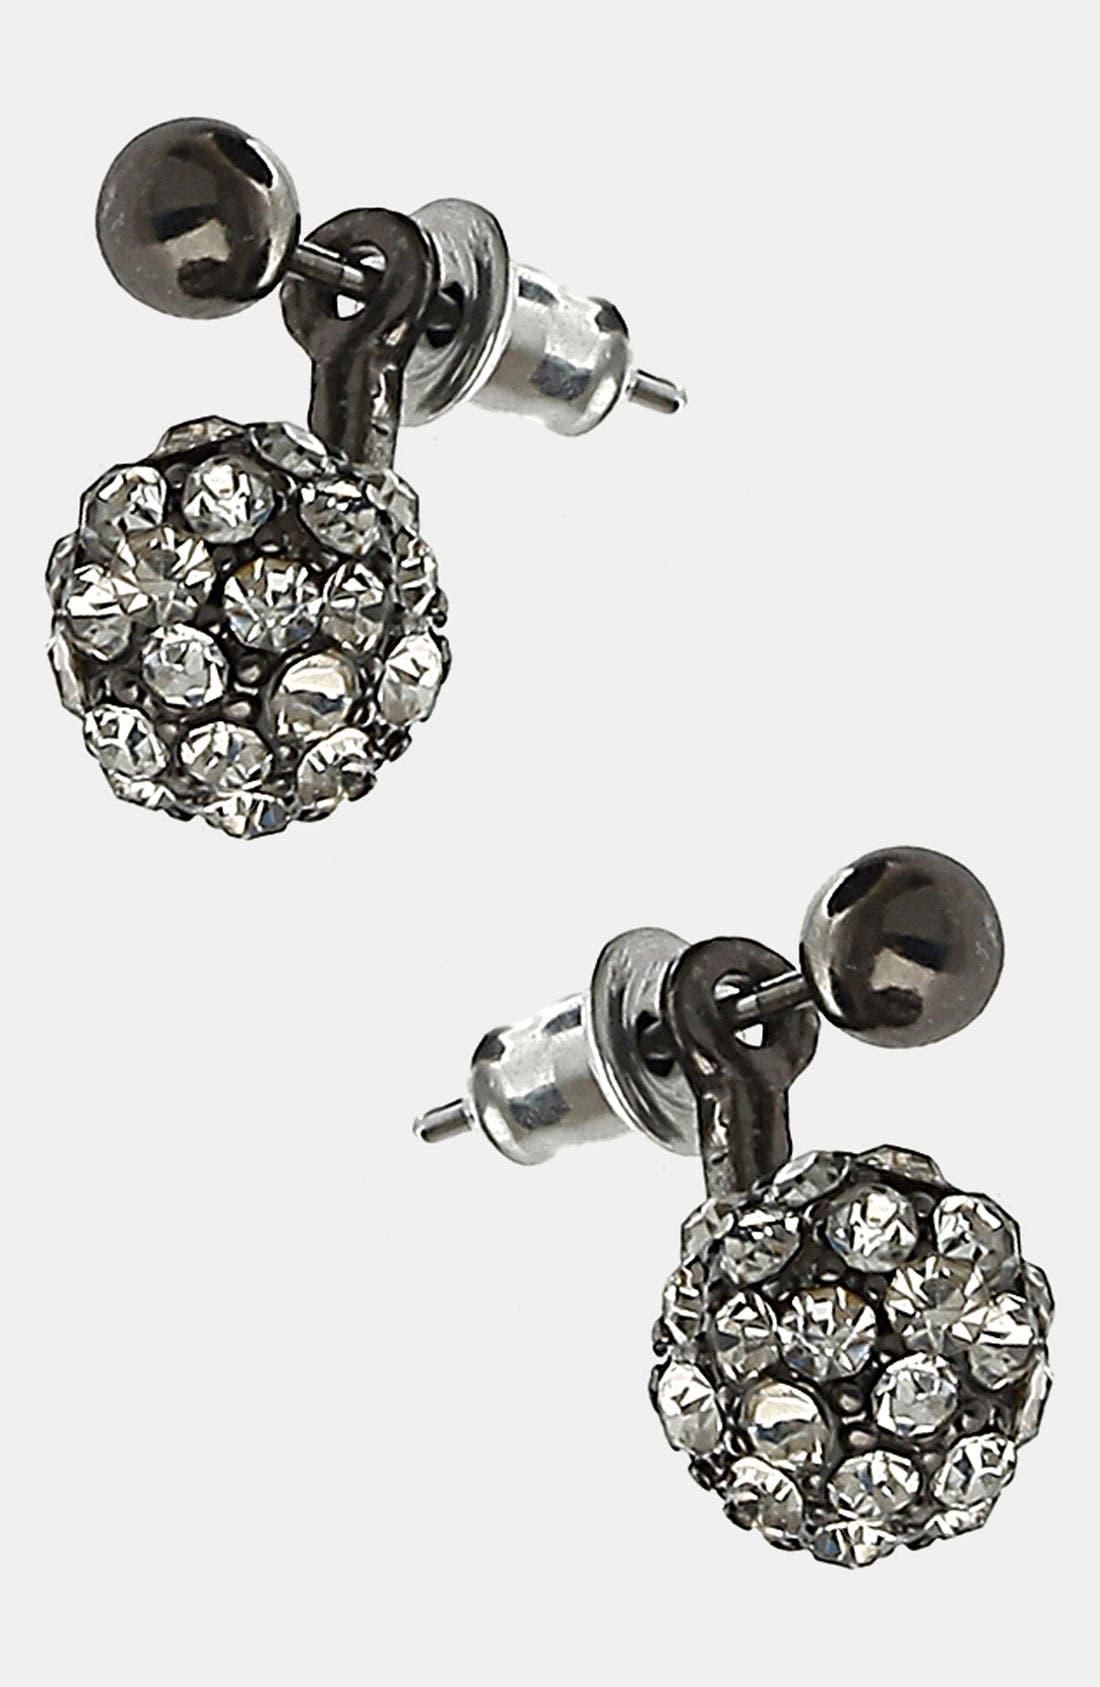 Alternate Image 1 Selected - Topshop 'Sparkle' Ball Earrings